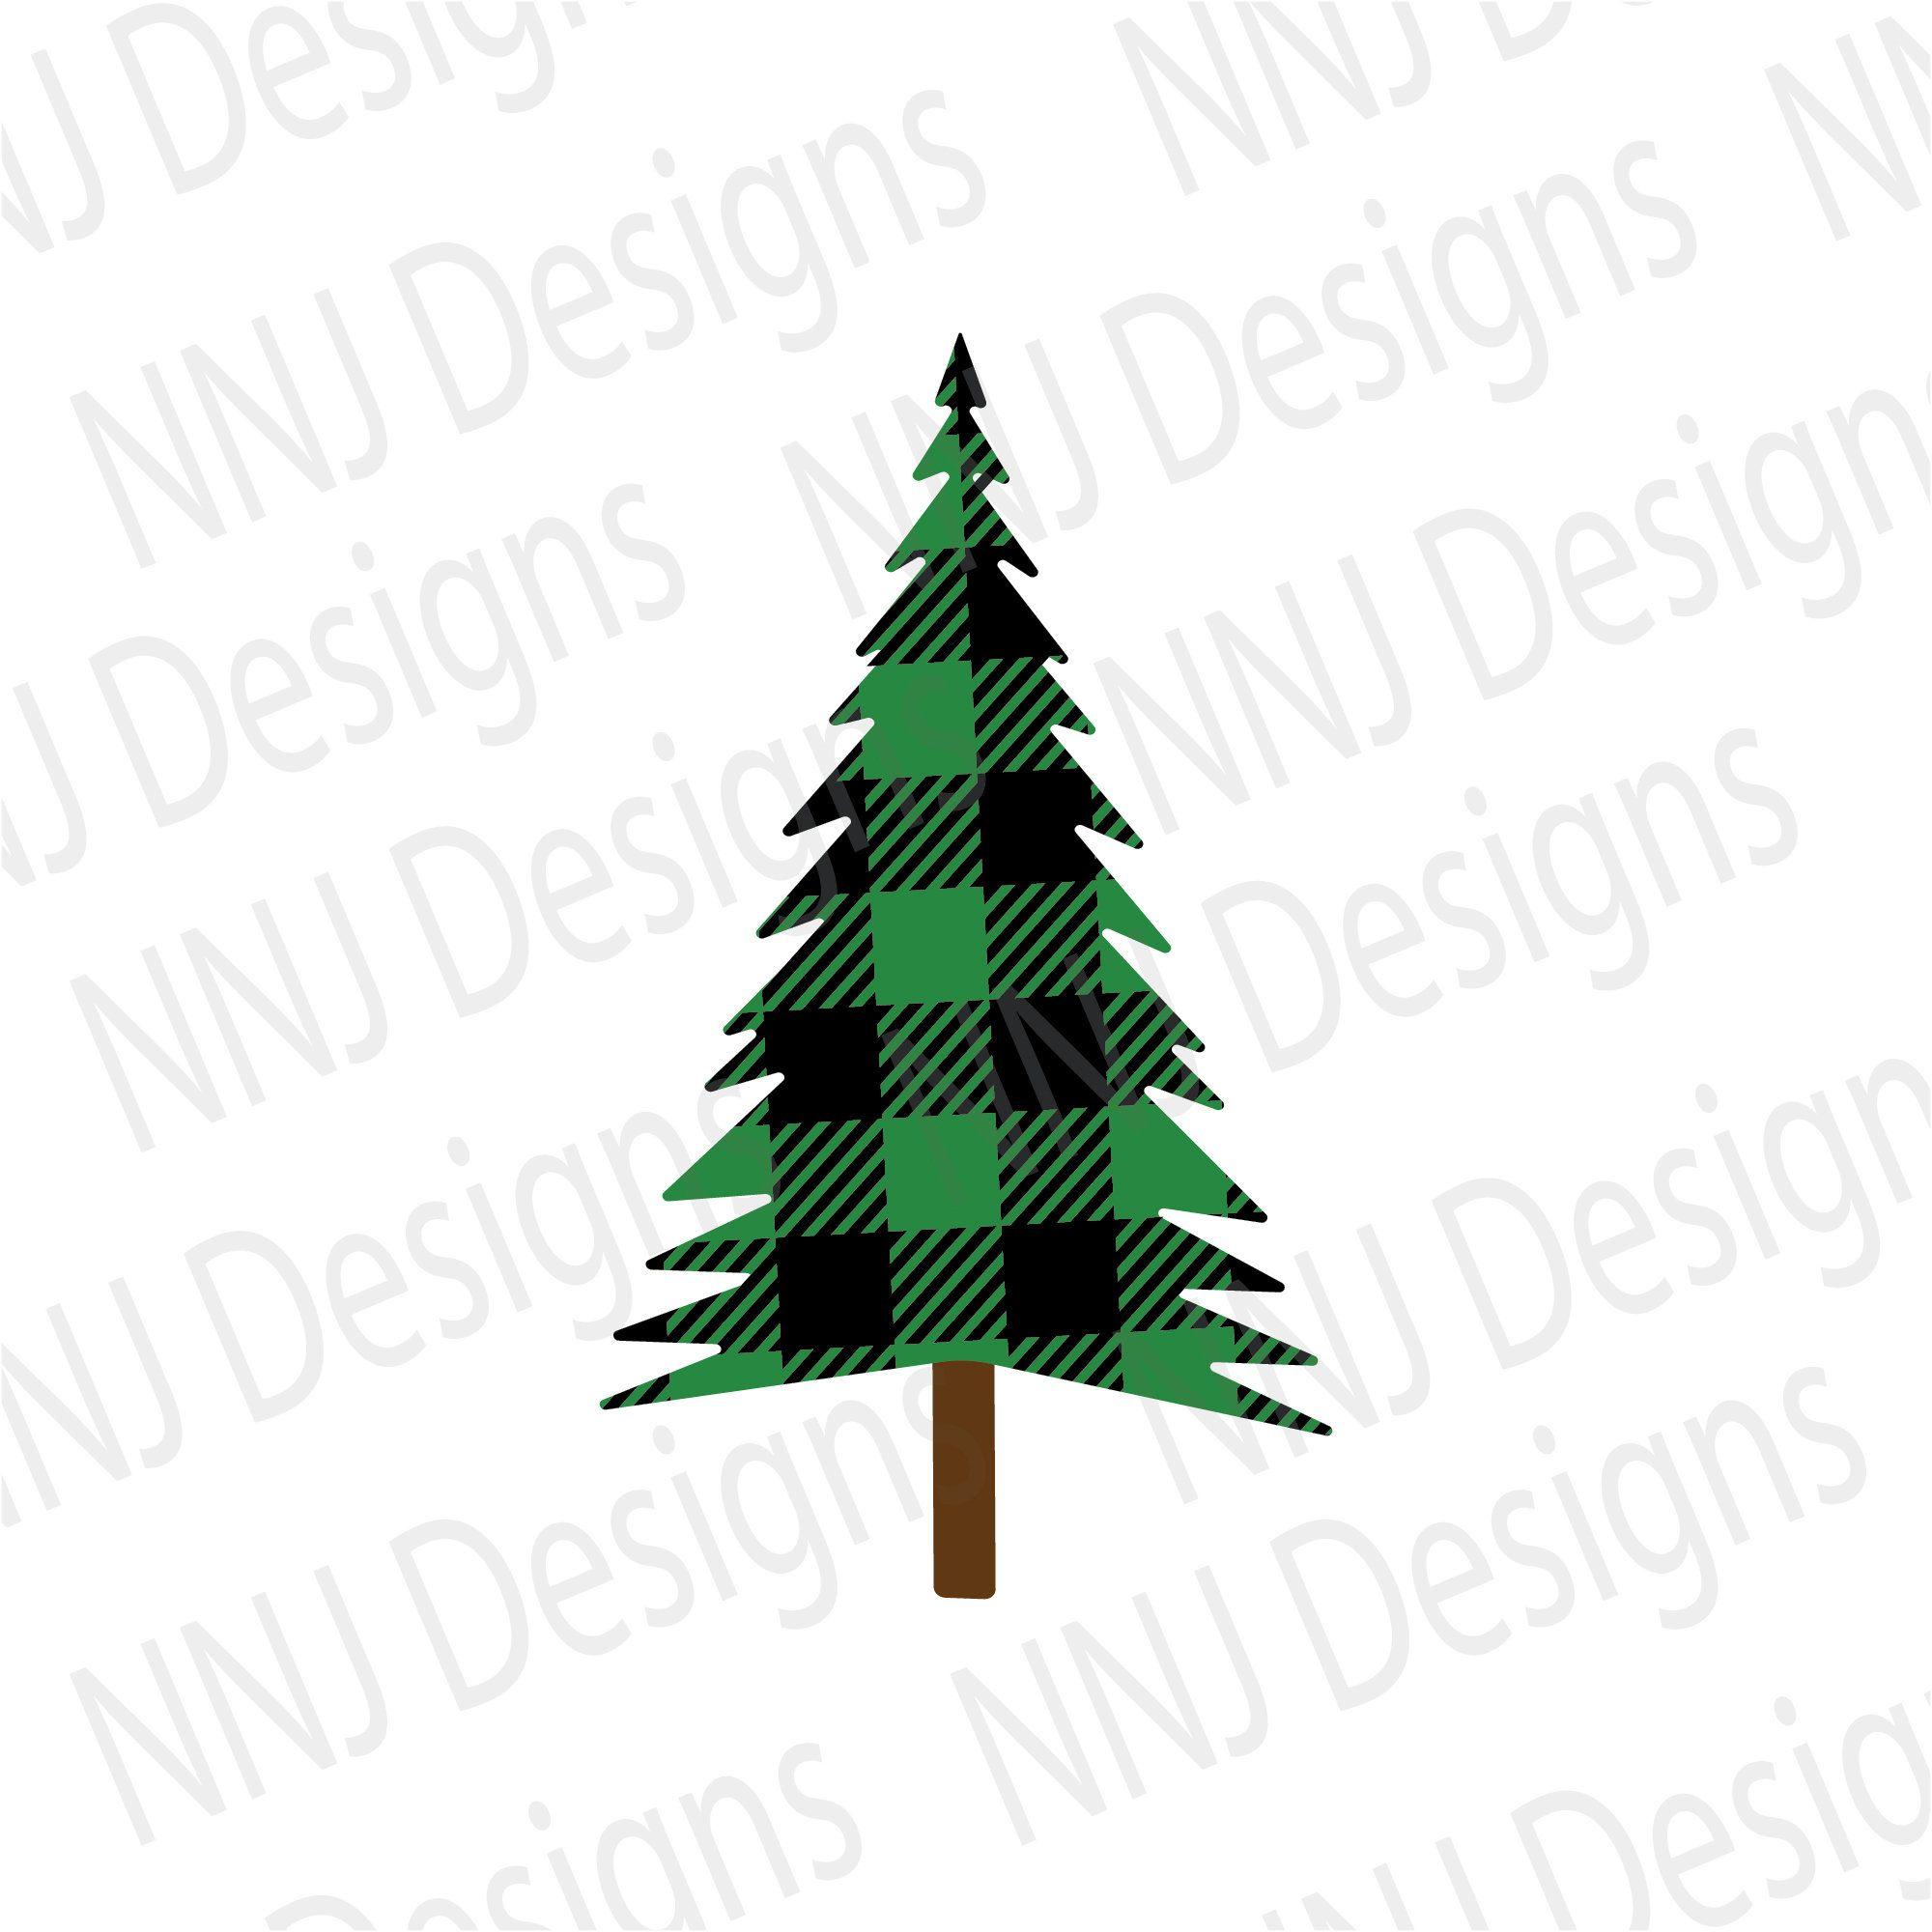 Buffalo Plaid Christmas Tree Svg Merry Christmas Png Clip Etsy In 2020 Buffalo Plaid Christmas Tree Plaid Christmas Tree Green Christmas Tree Decorations